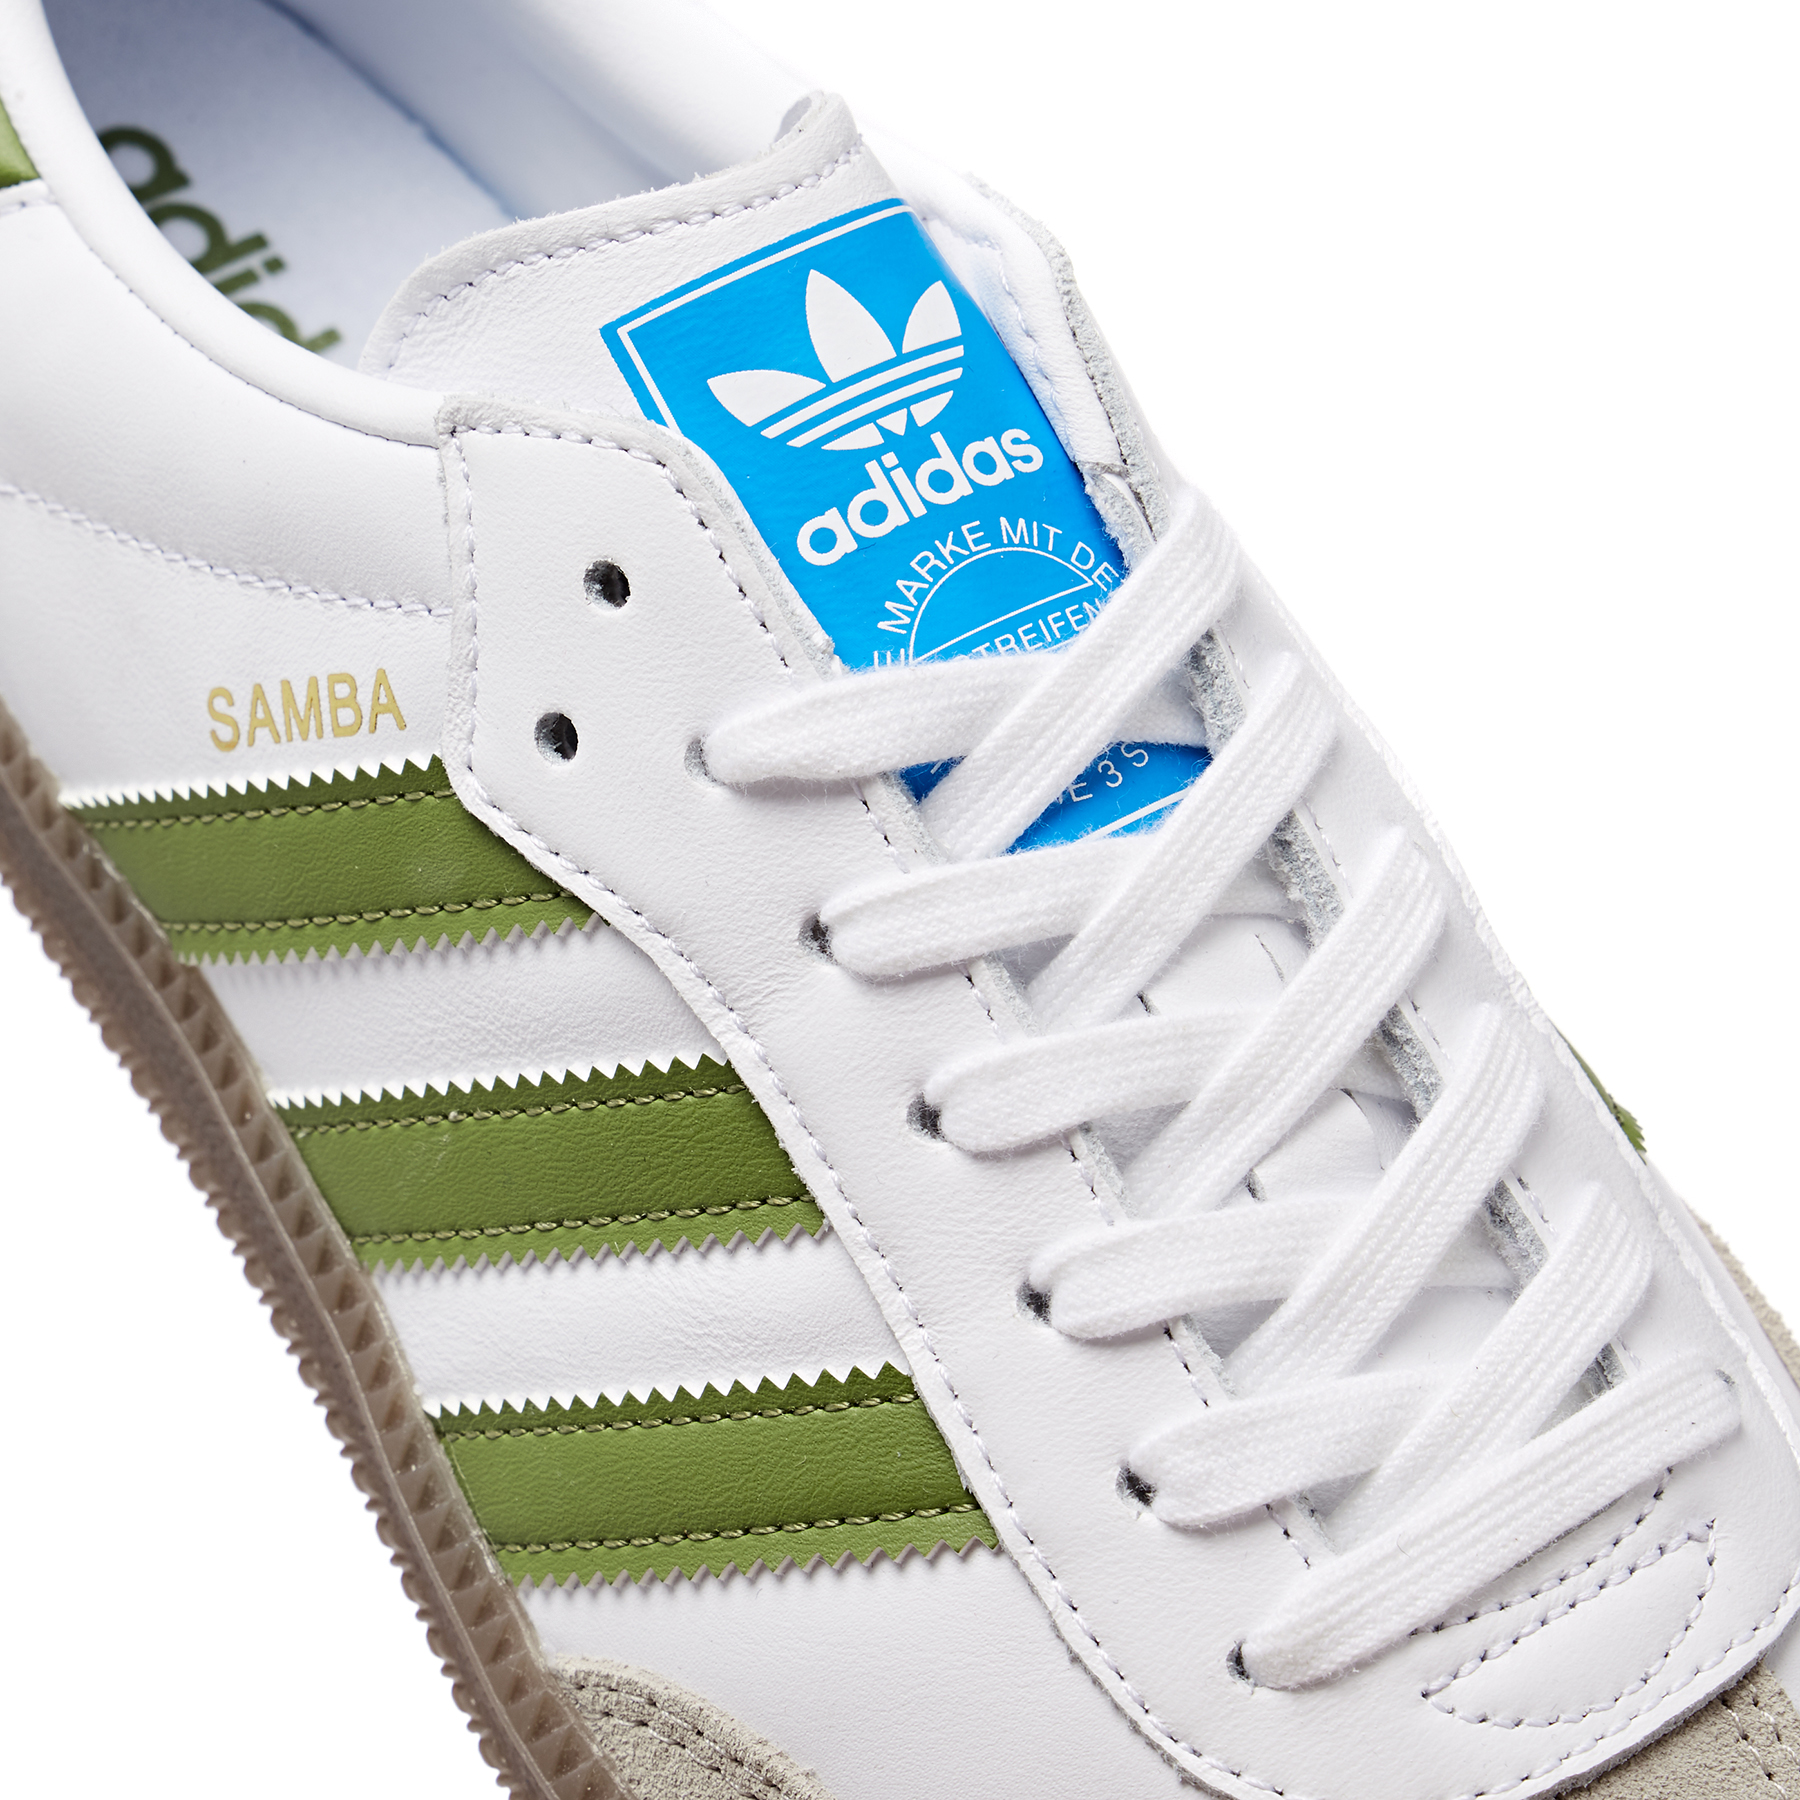 Adidas Originals Samba Shoes | Free Delivery Options